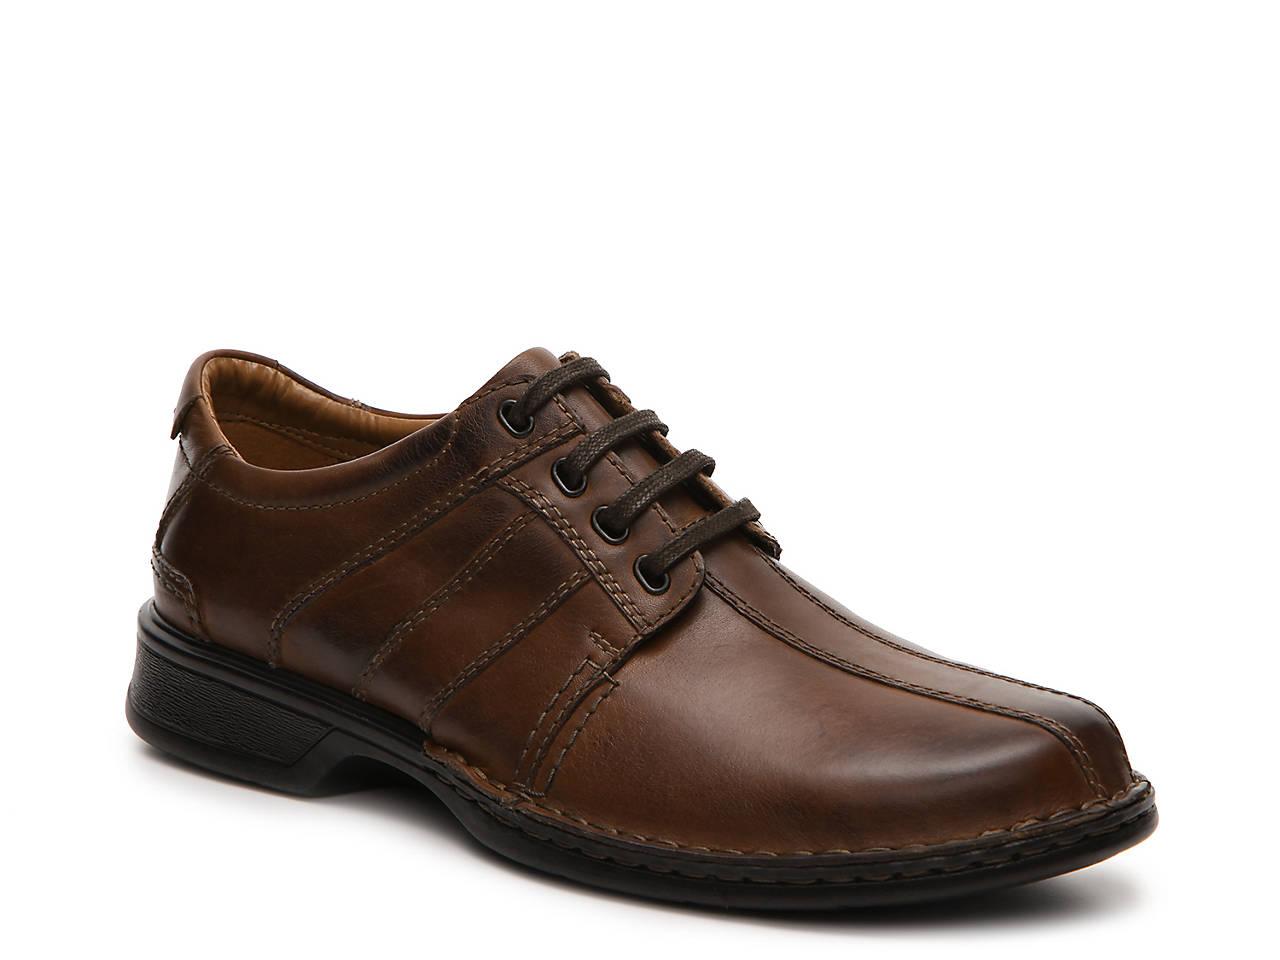 d03d6e225 Clarks Touareg Vibe Oxford Men s Shoes